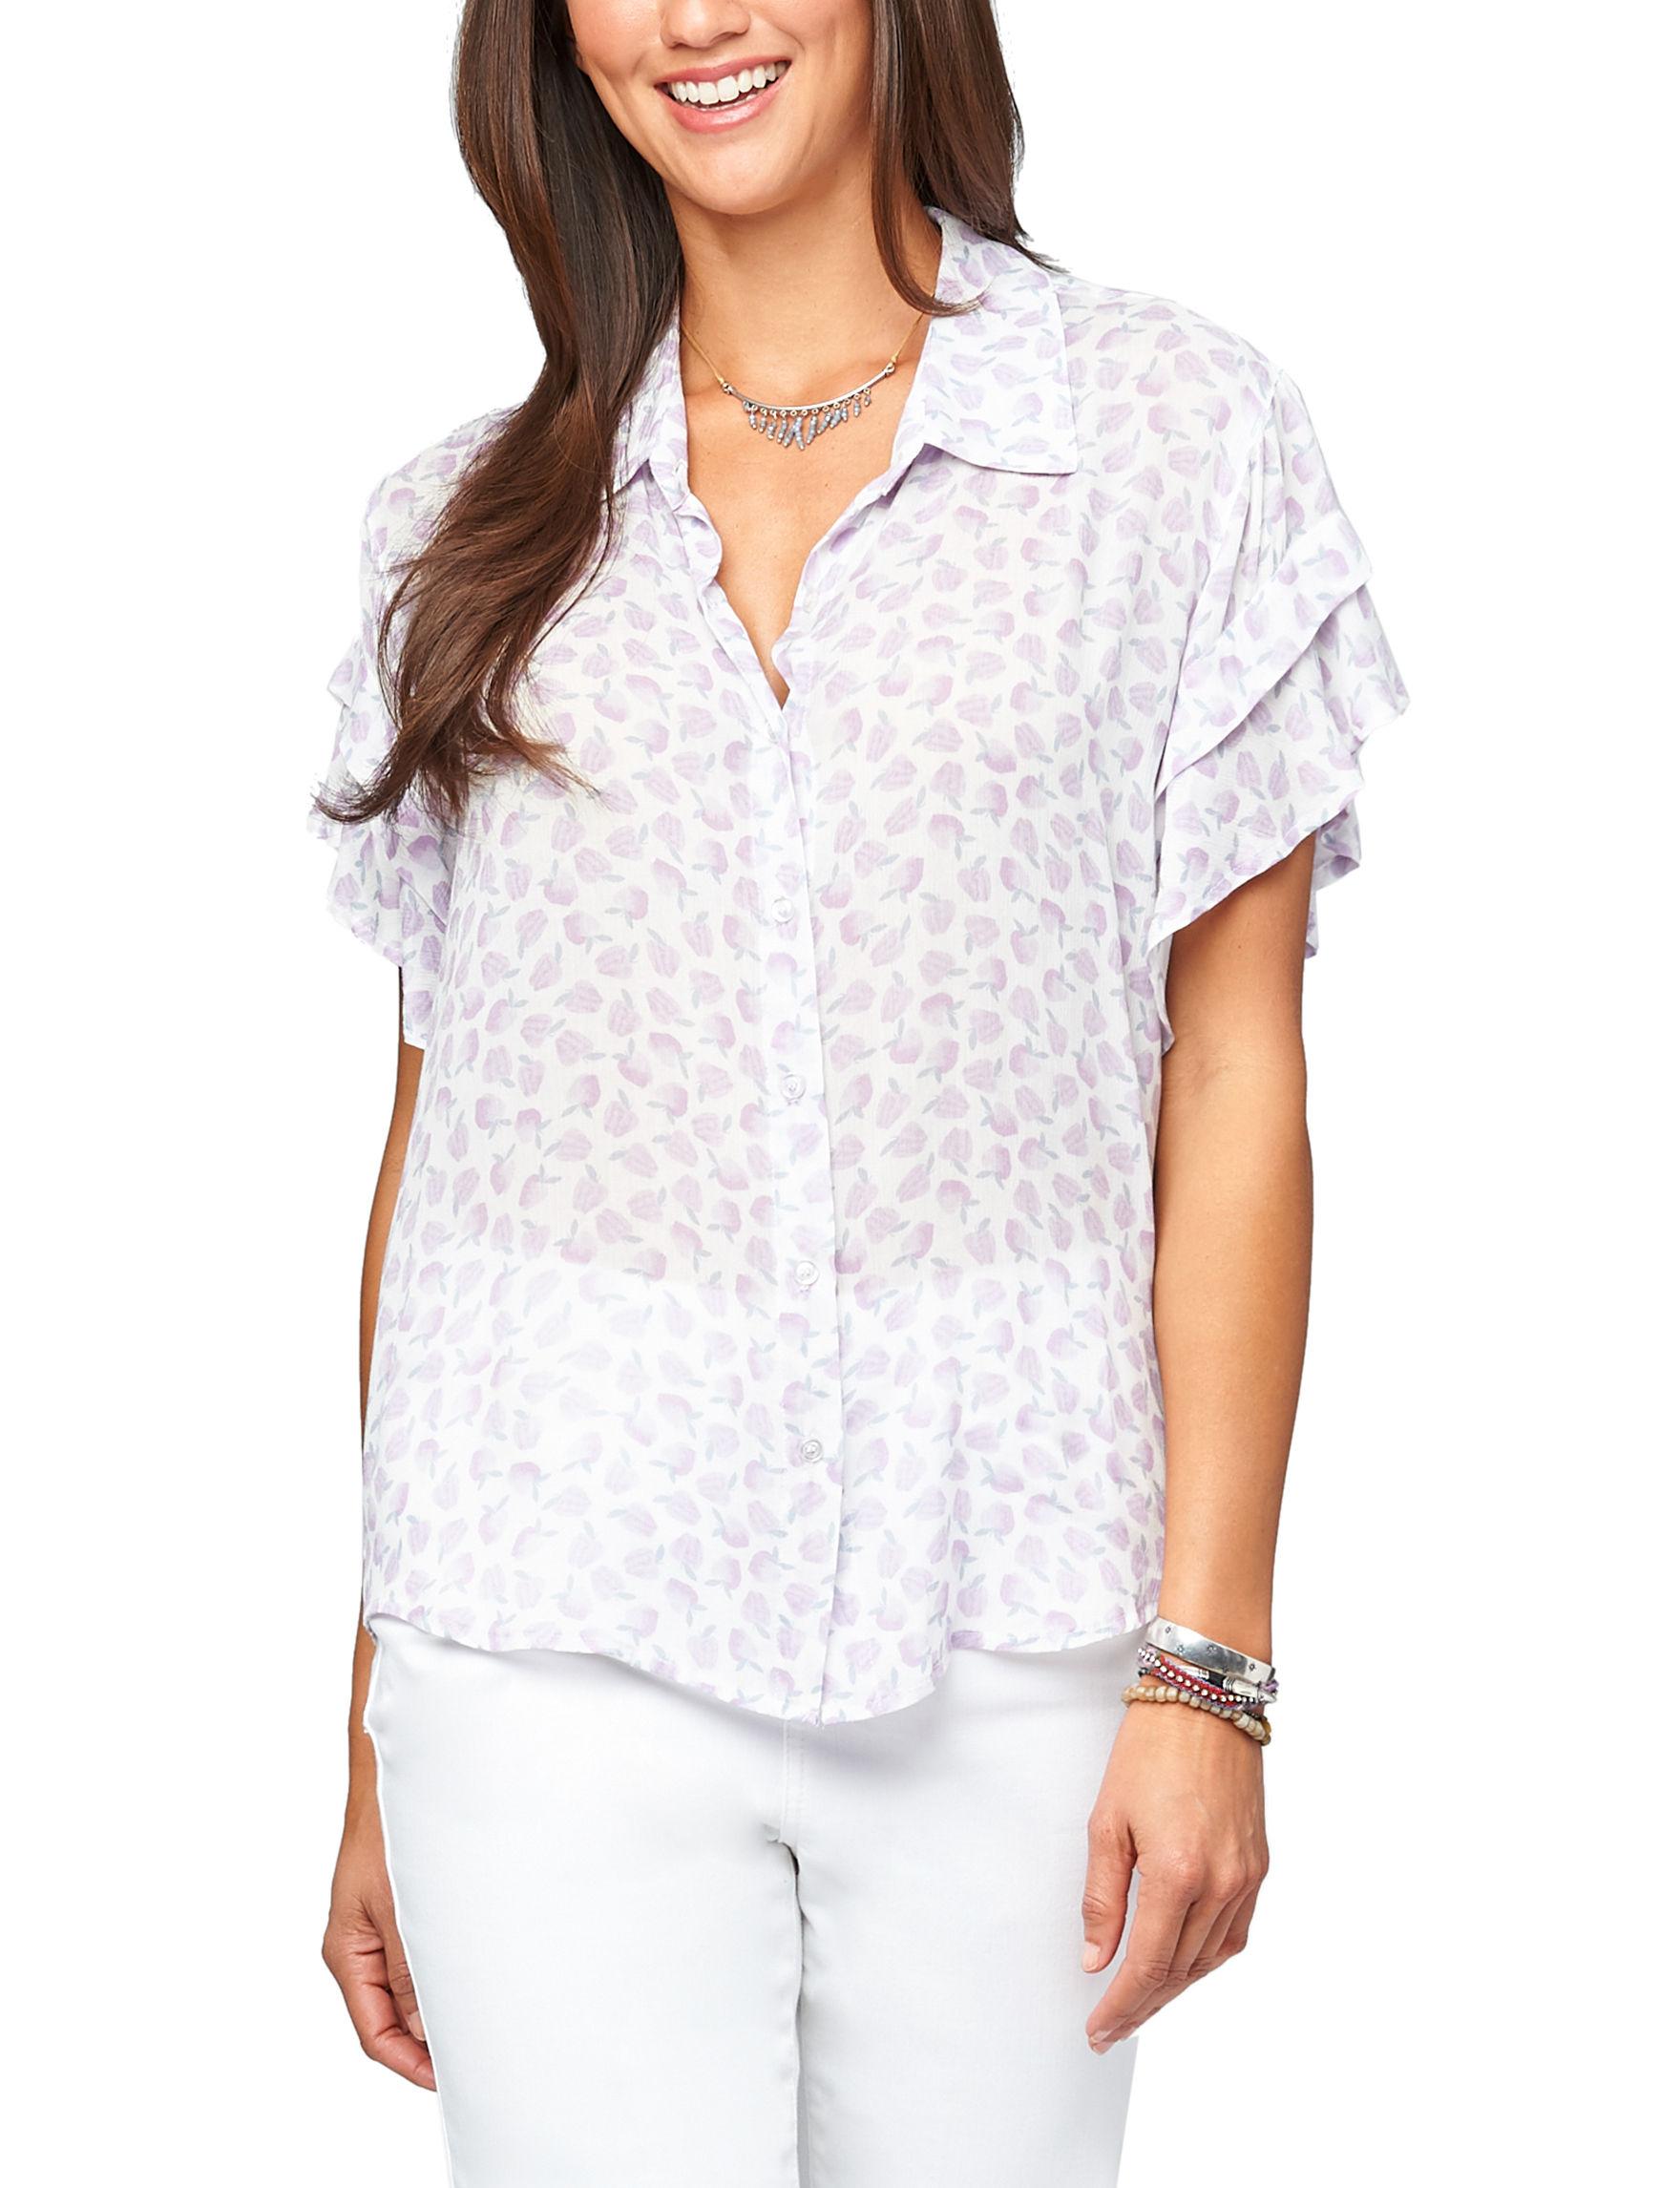 Democracy White Lilac Shirts & Blouses